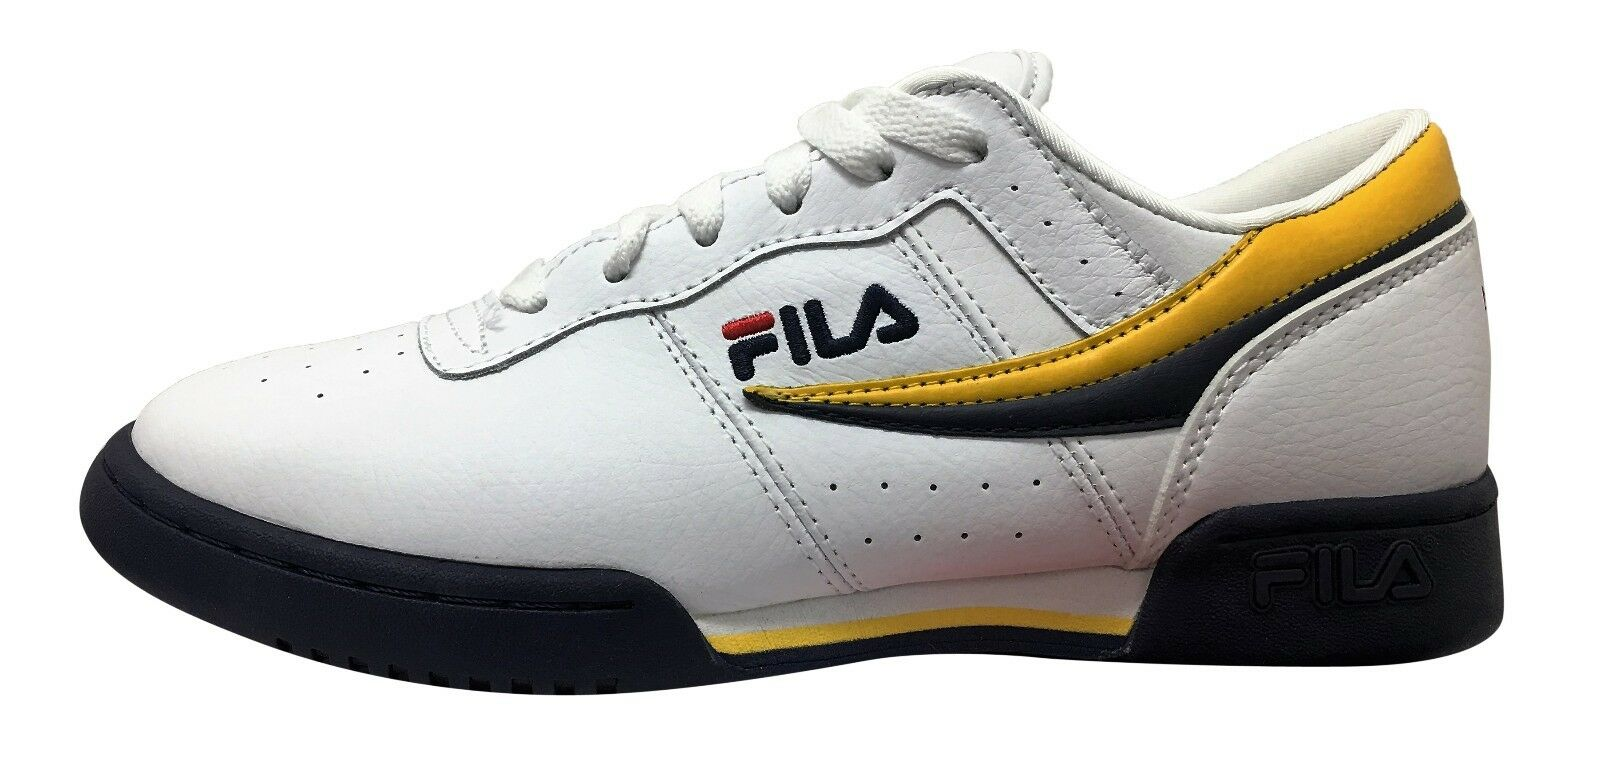 Fila Fitness blancooo blancooo blancooo Azul Marino Original Limón (1FM00081 138 cfdbc2